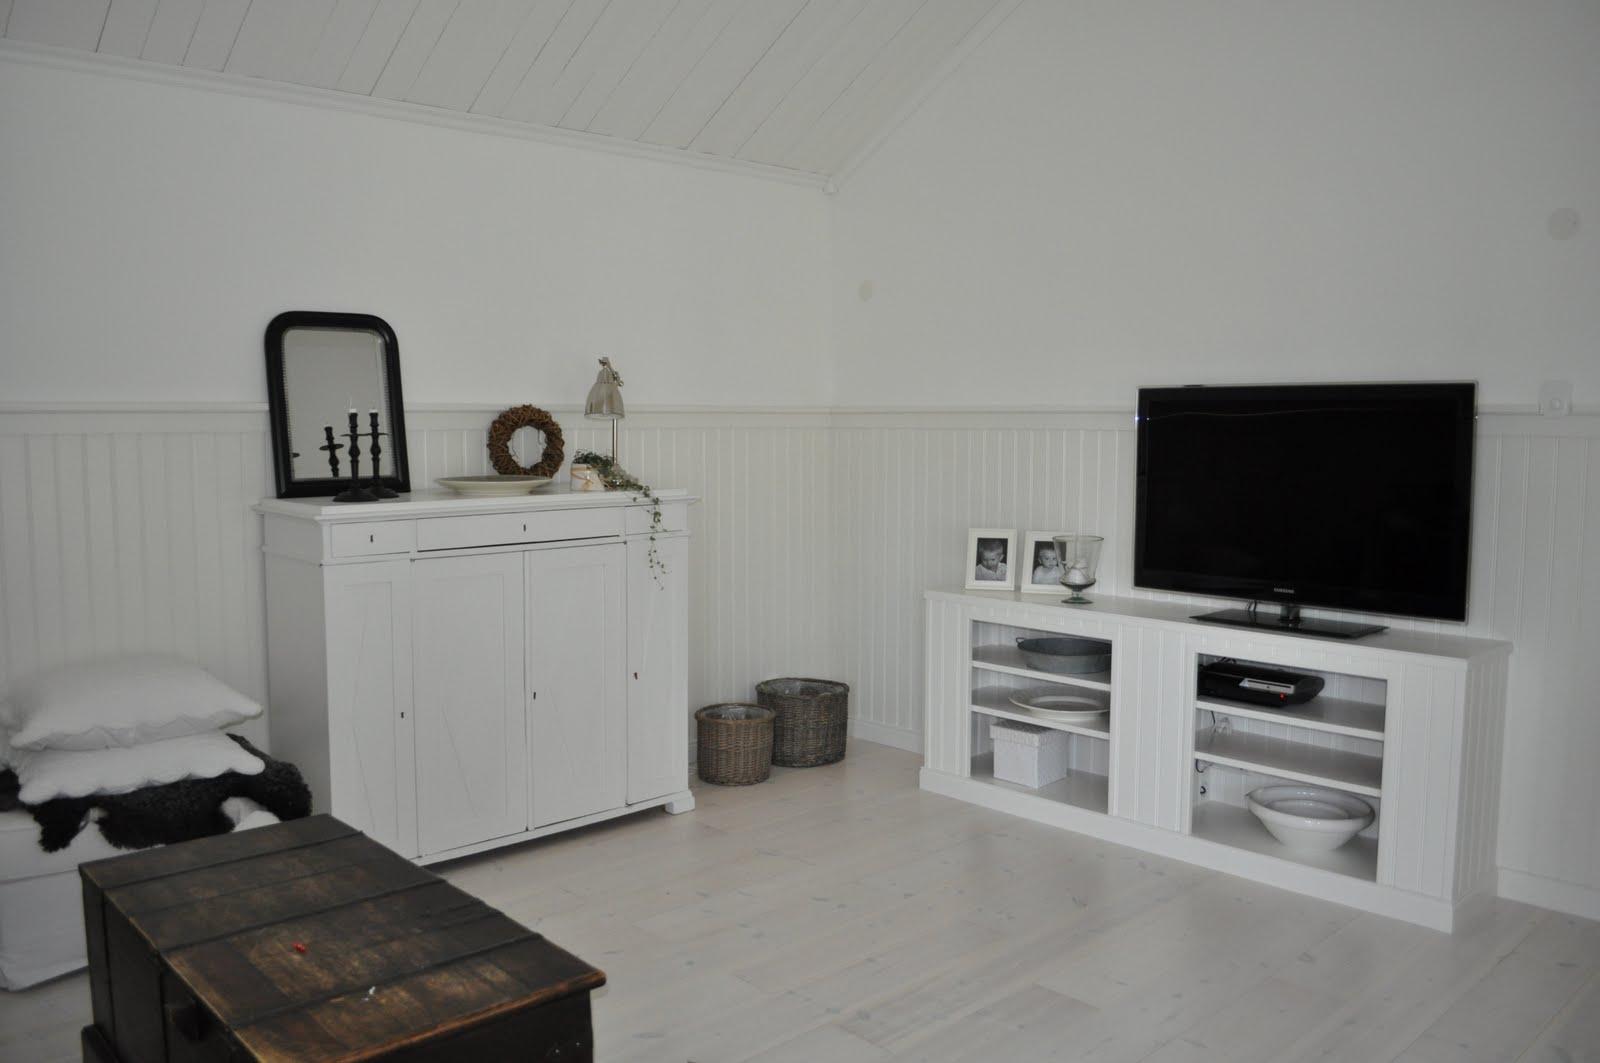 Hörnskåp kök ikea ~ Zeedub.com